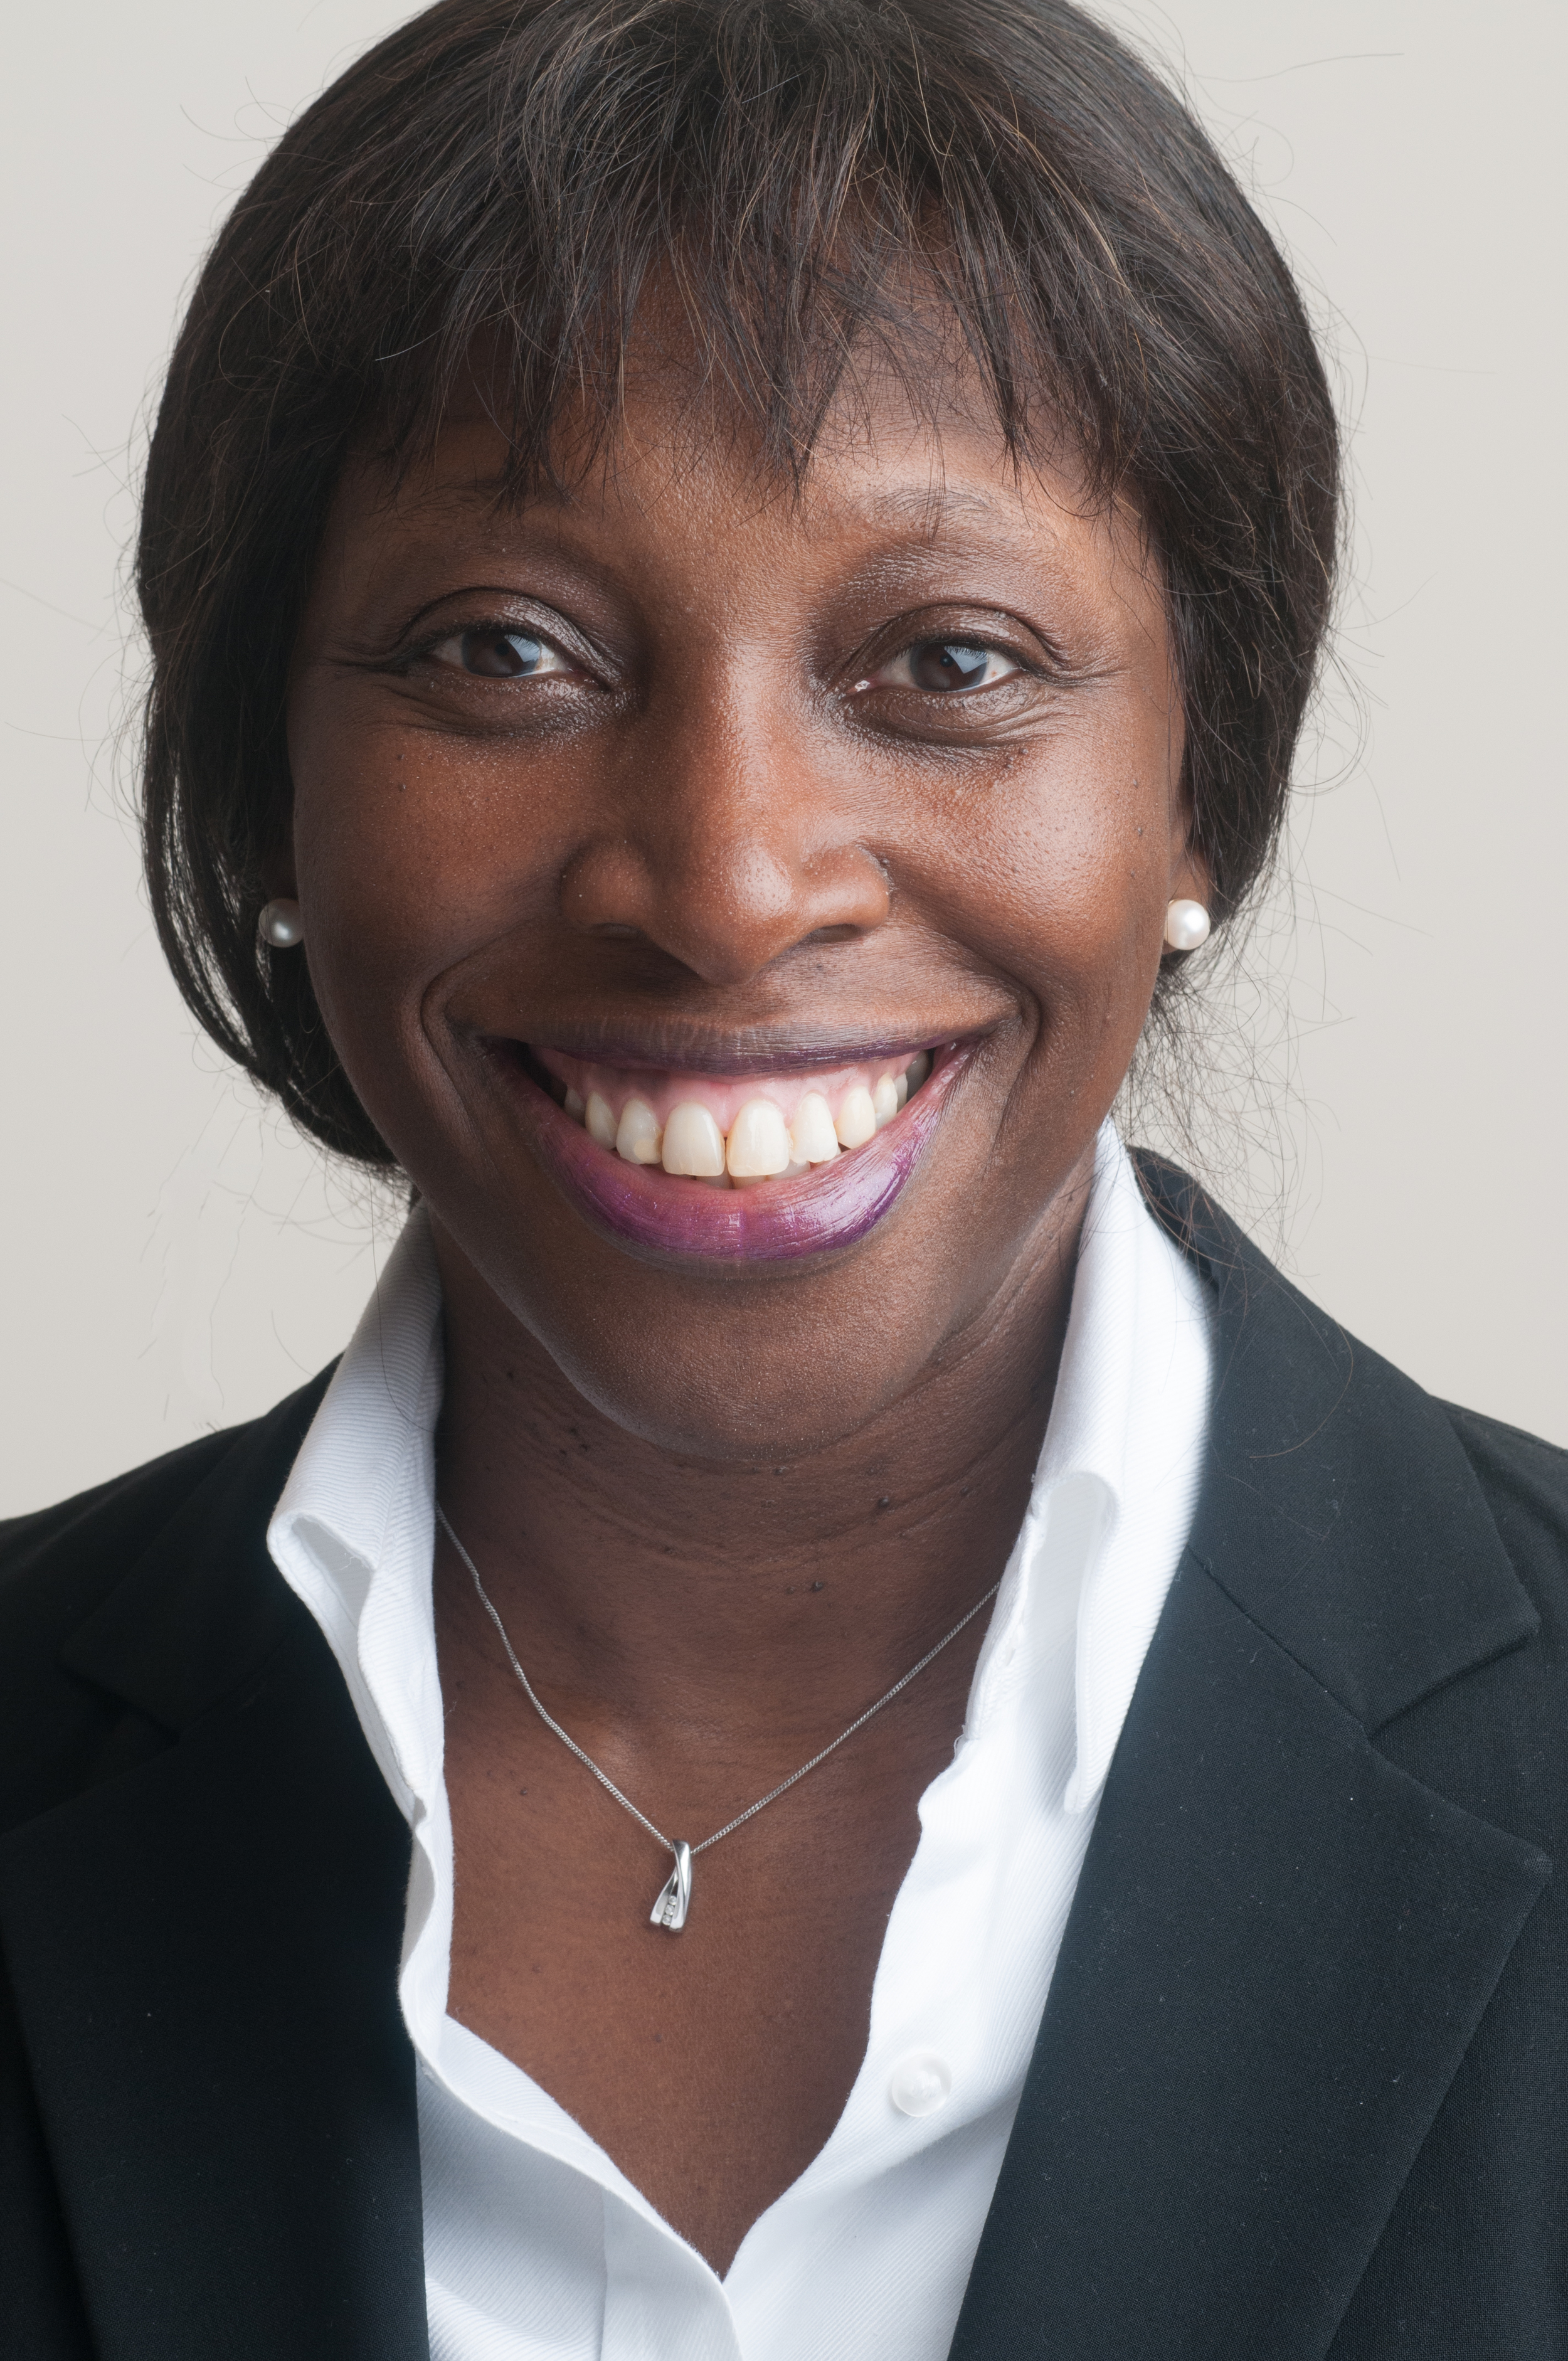 Black businesswoman.jpg